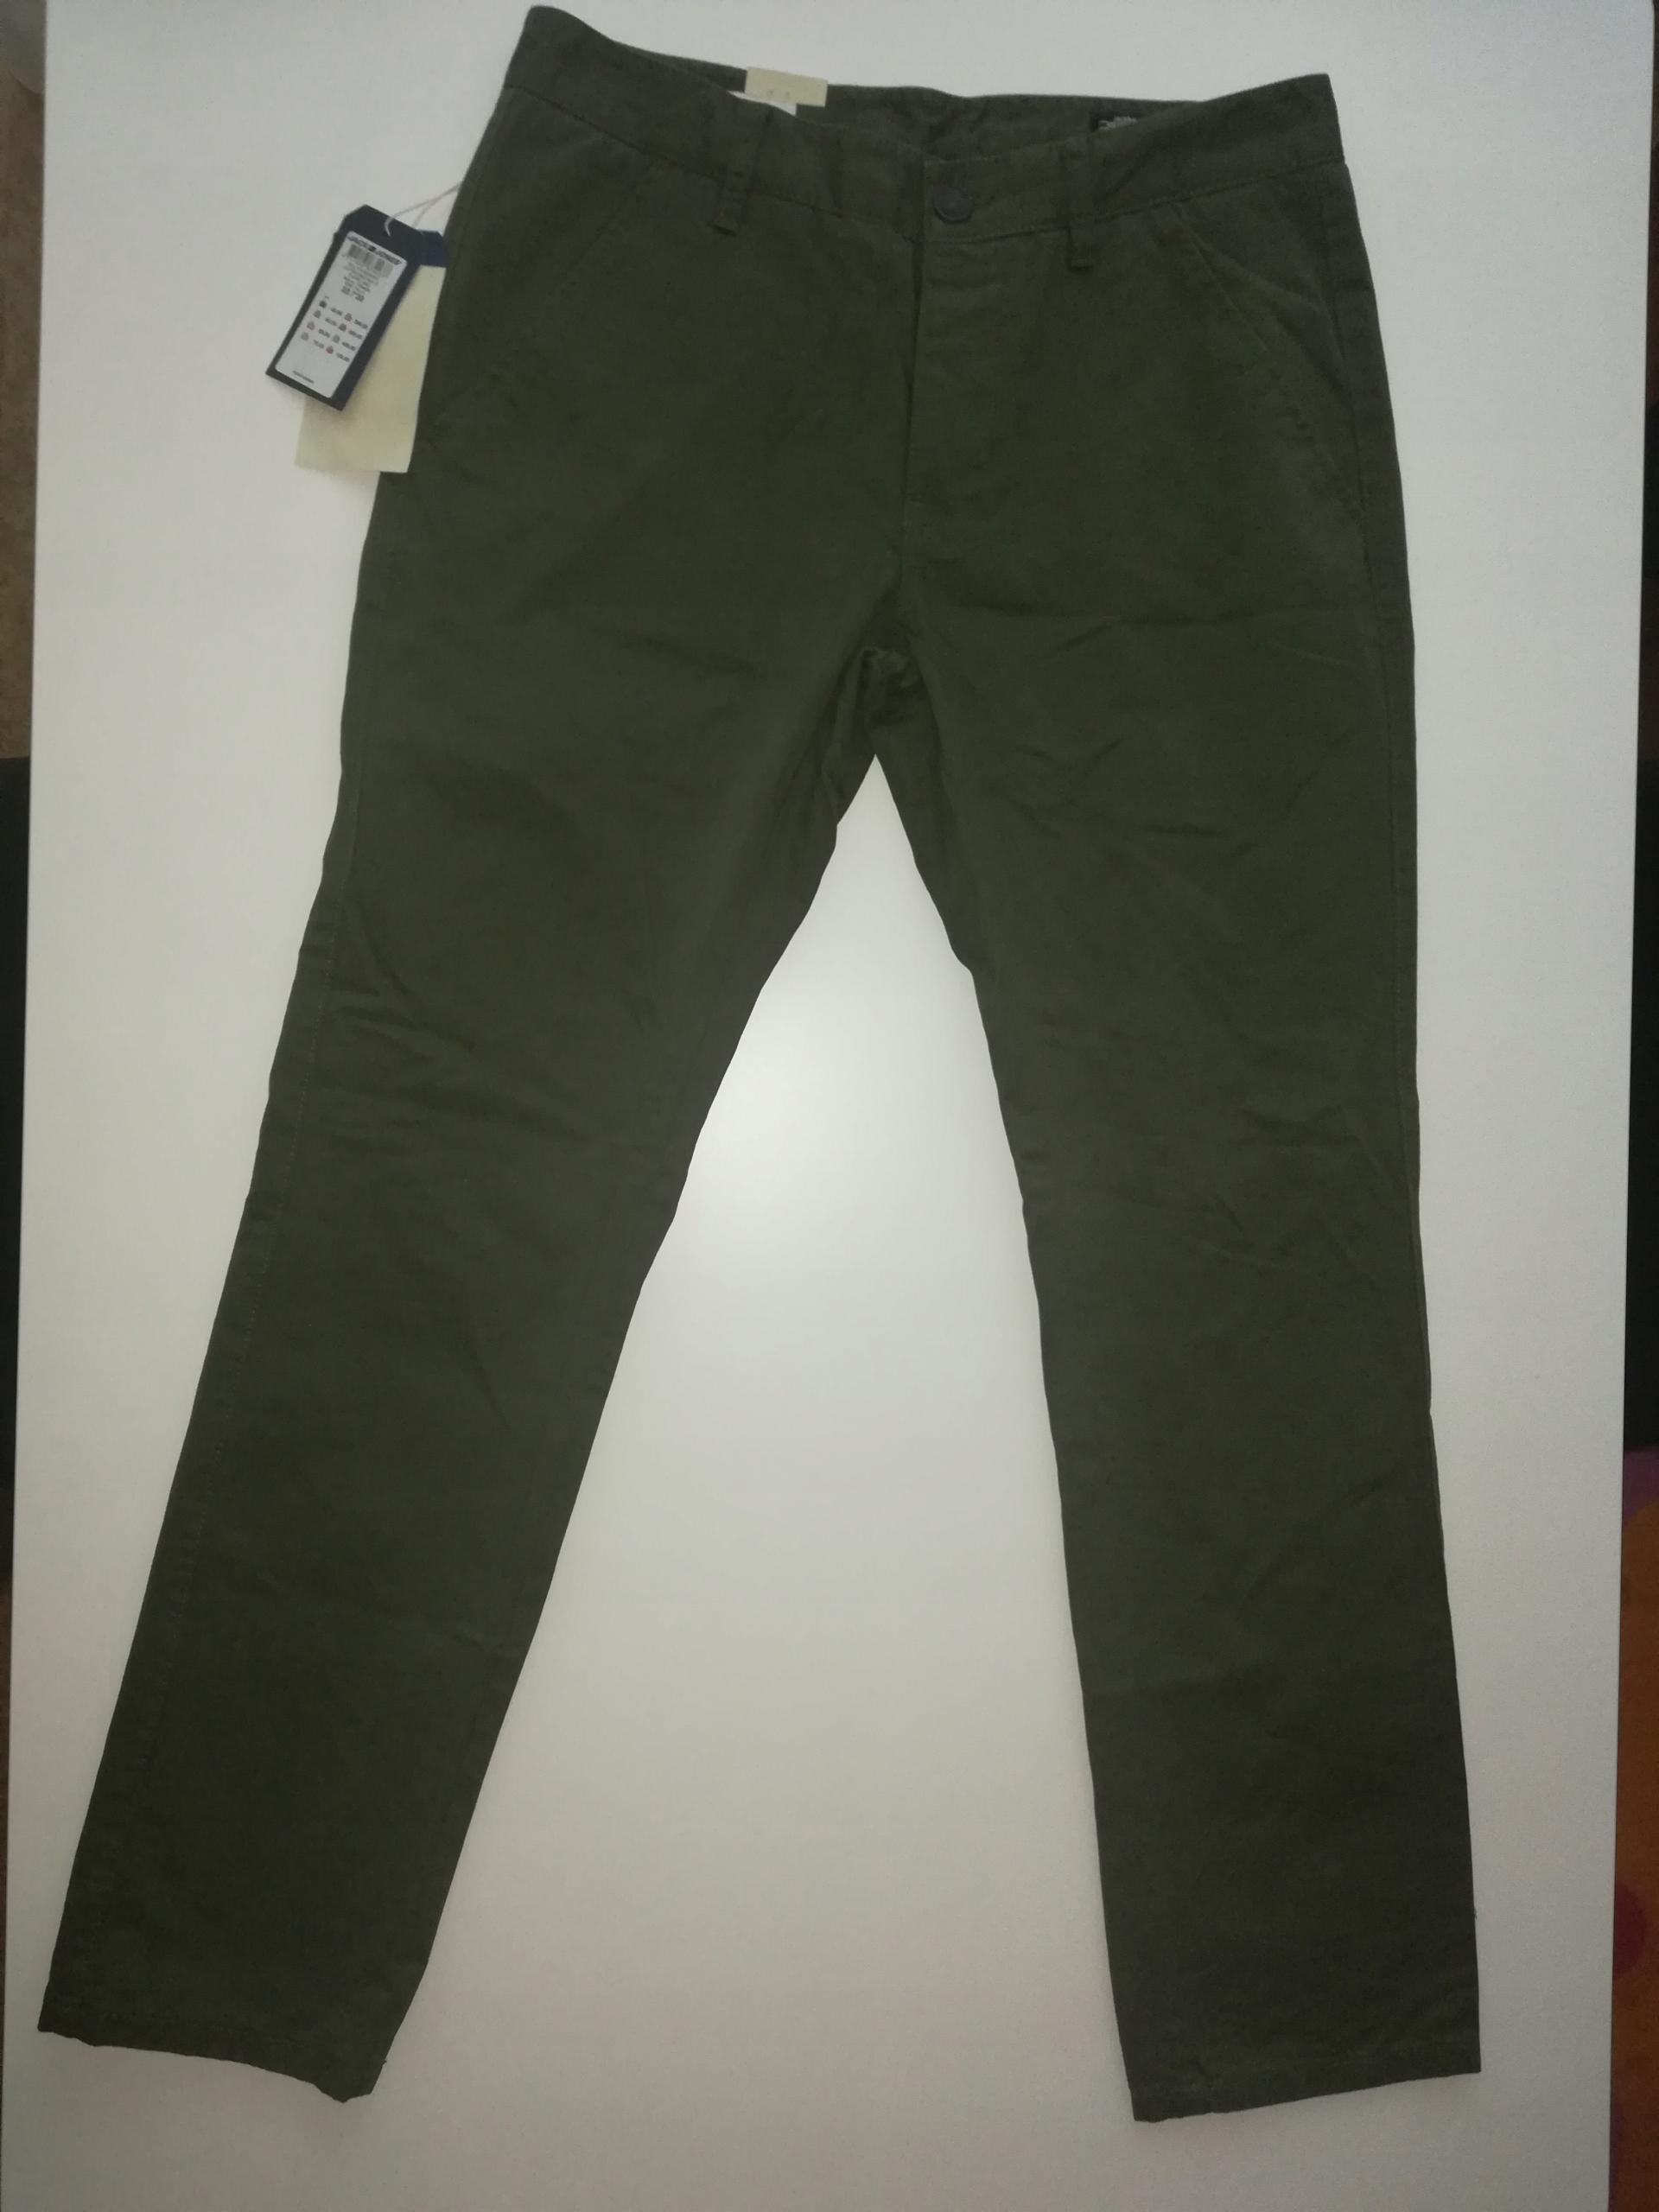 Jack & Jones spodnie męskie slim fit 32/30